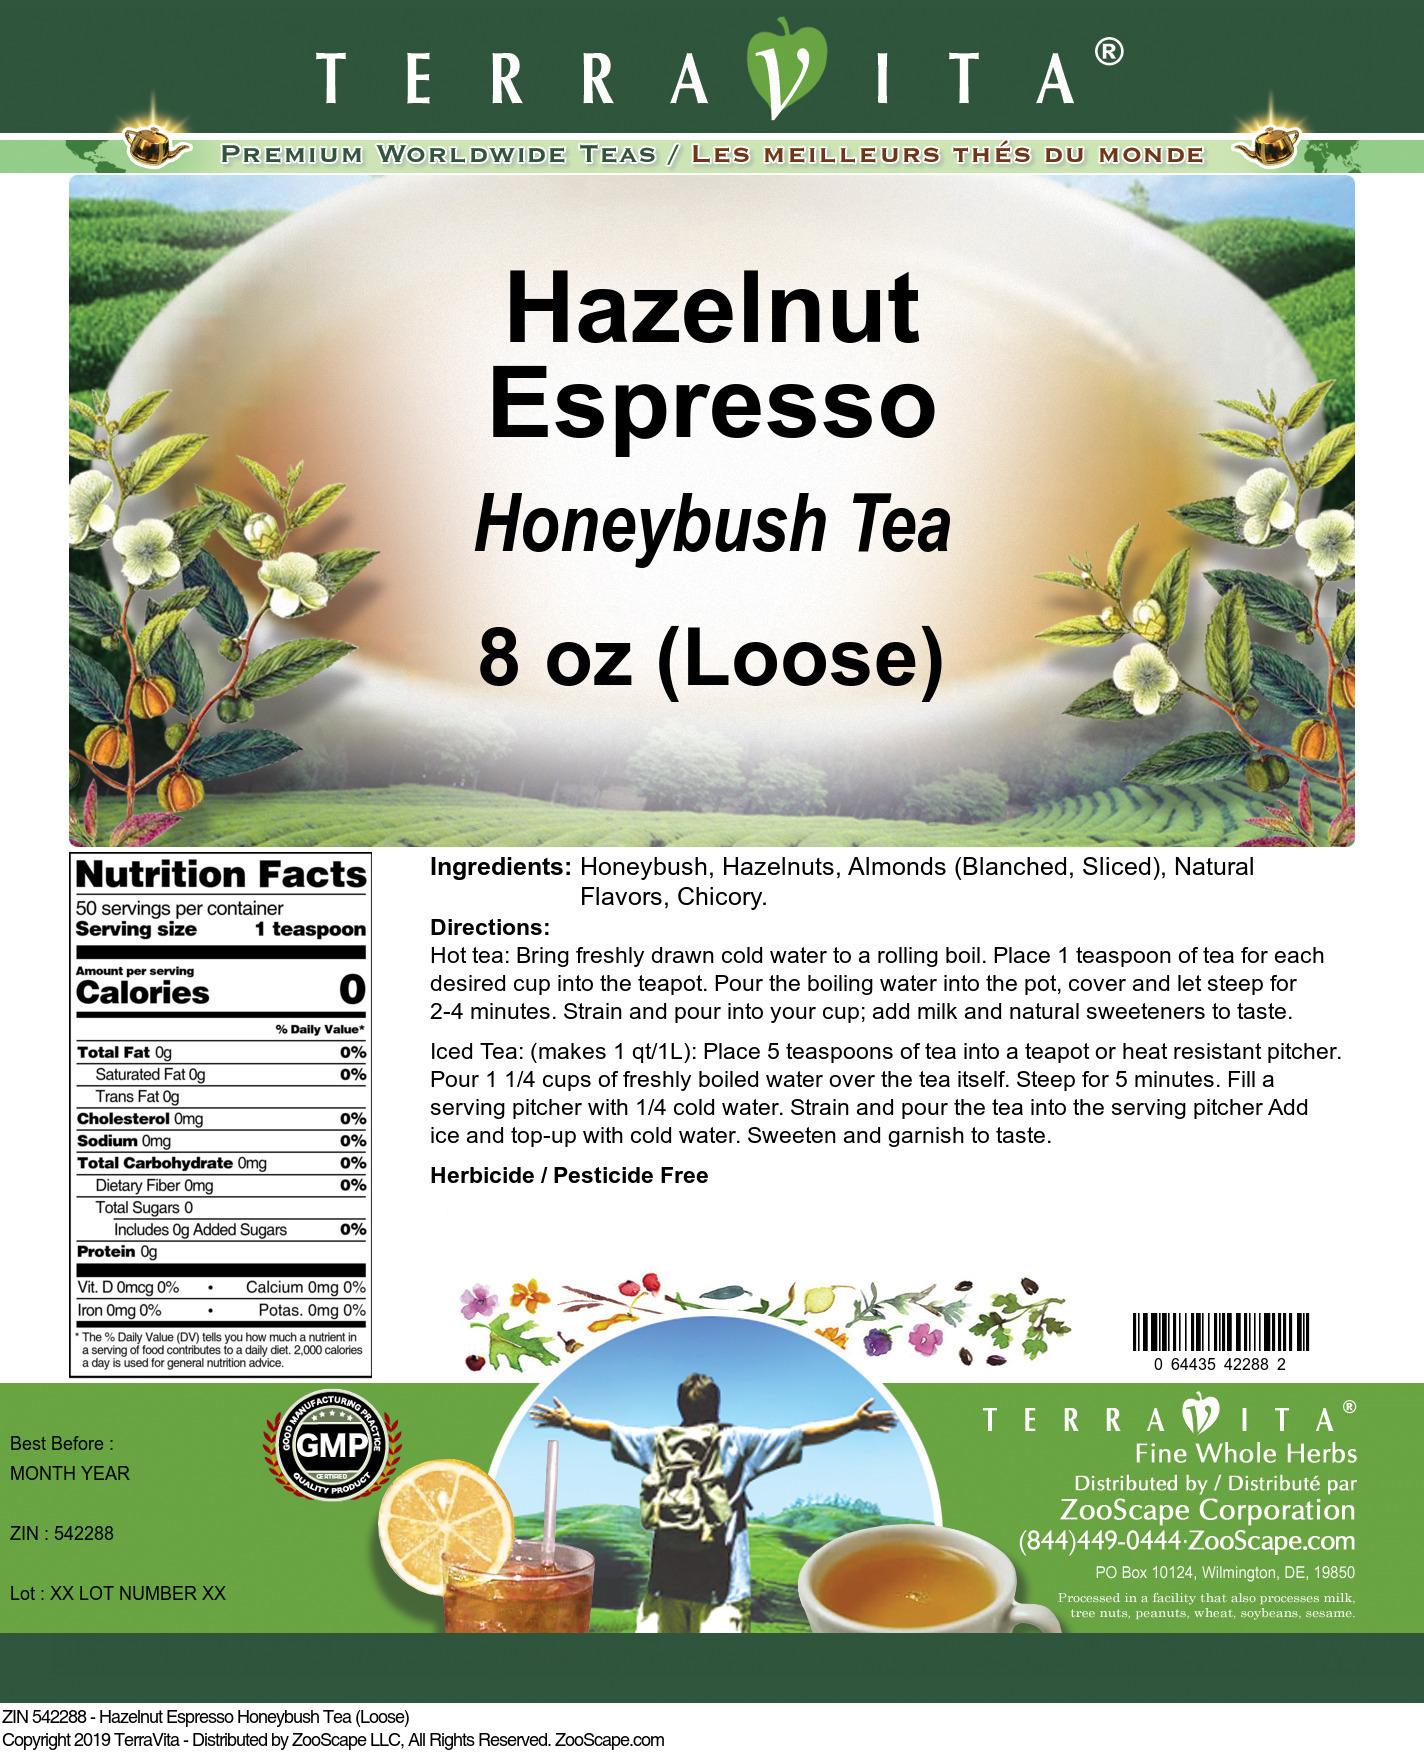 Hazelnut Espresso Honeybush Tea